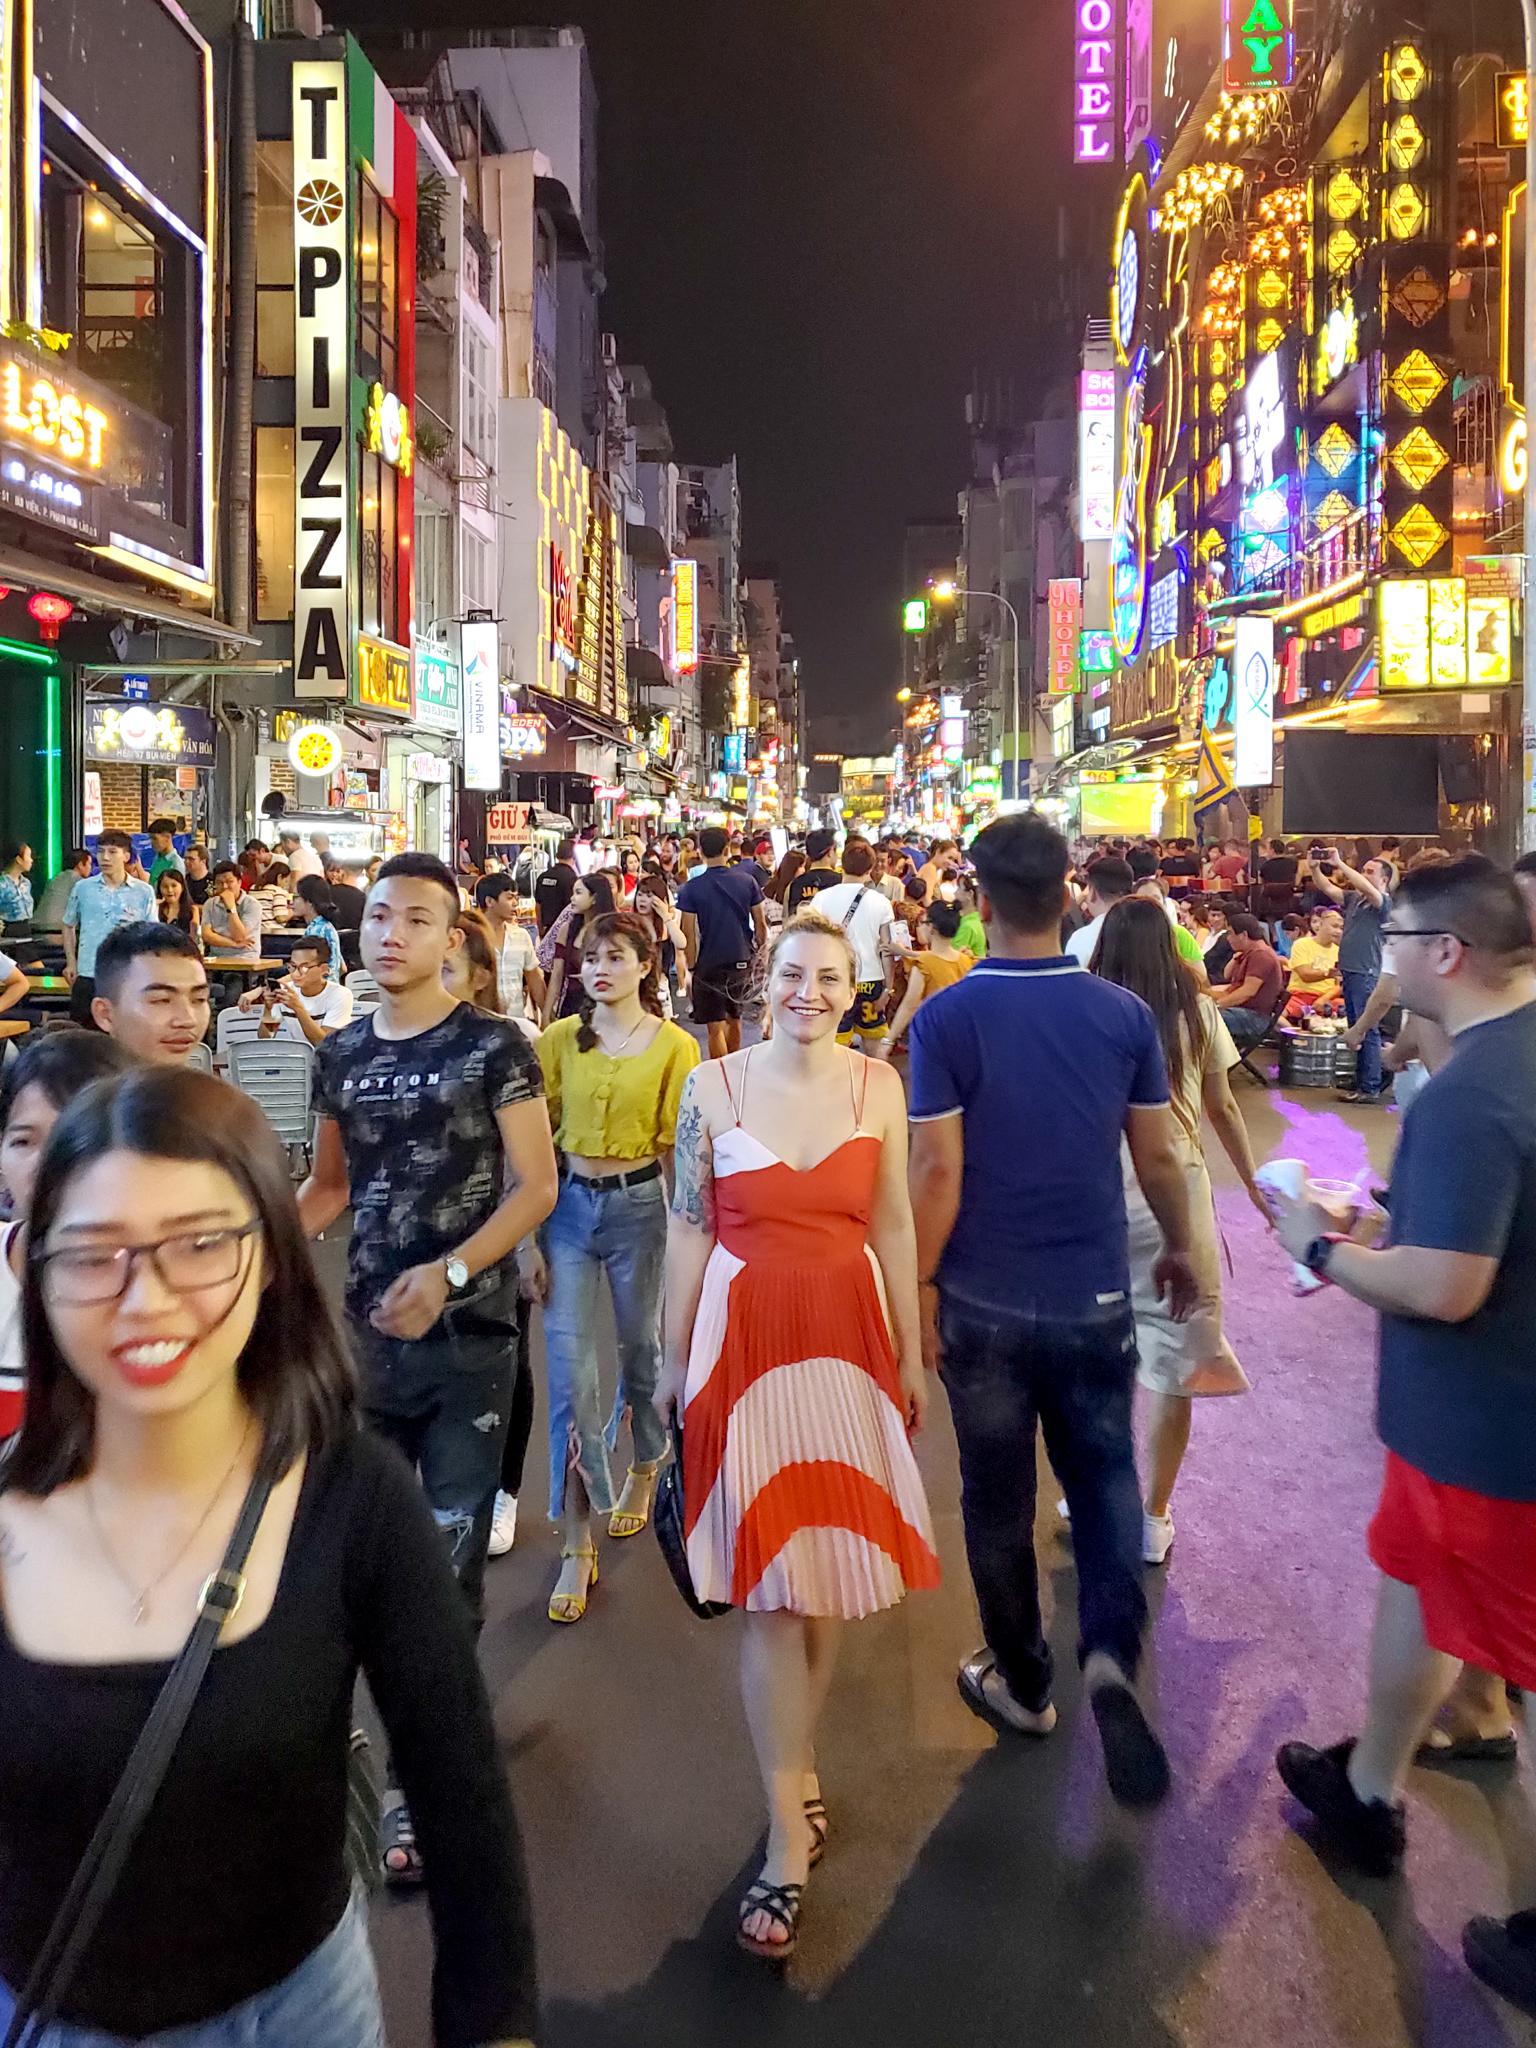 Uprooted-Traveler-bui-vien-street-Ho-Chi-Minh-48-hour-itinerary-saigon.jpg